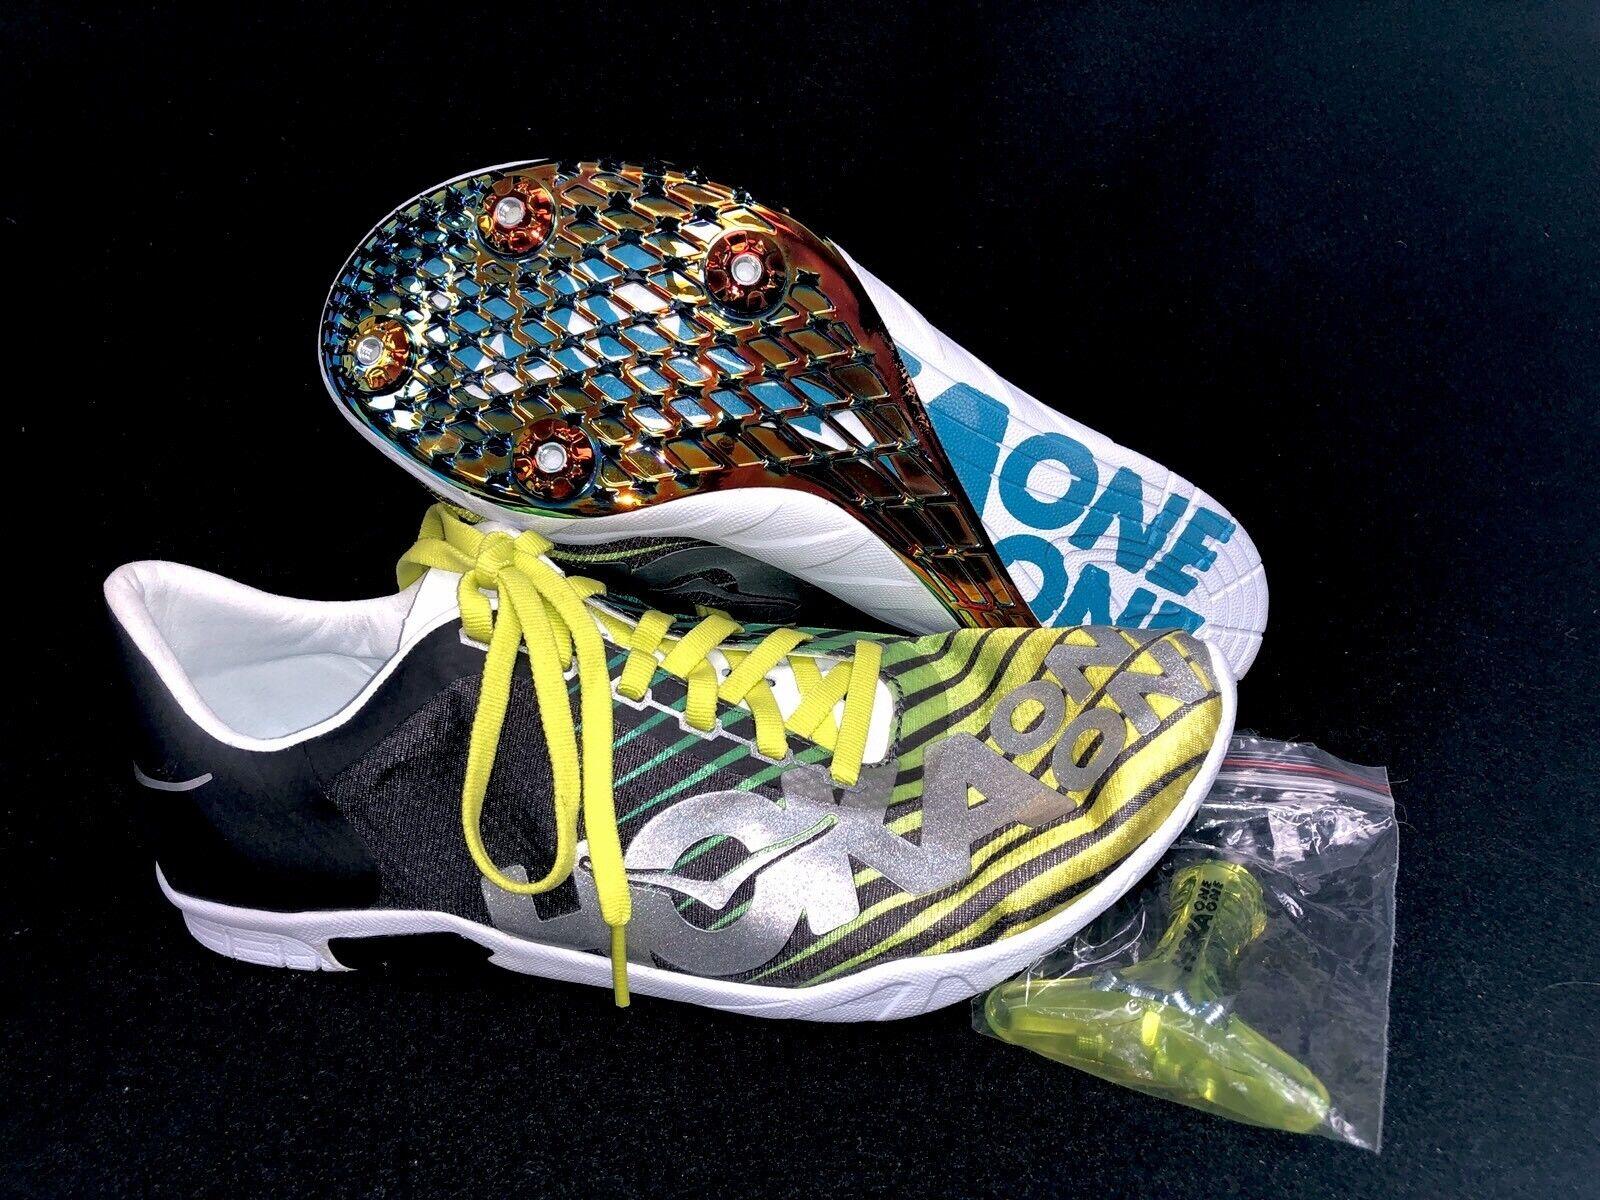 Hoka One One Speed Evo R Rio Mens schuhe Running Track Gelb Grün Silber grau